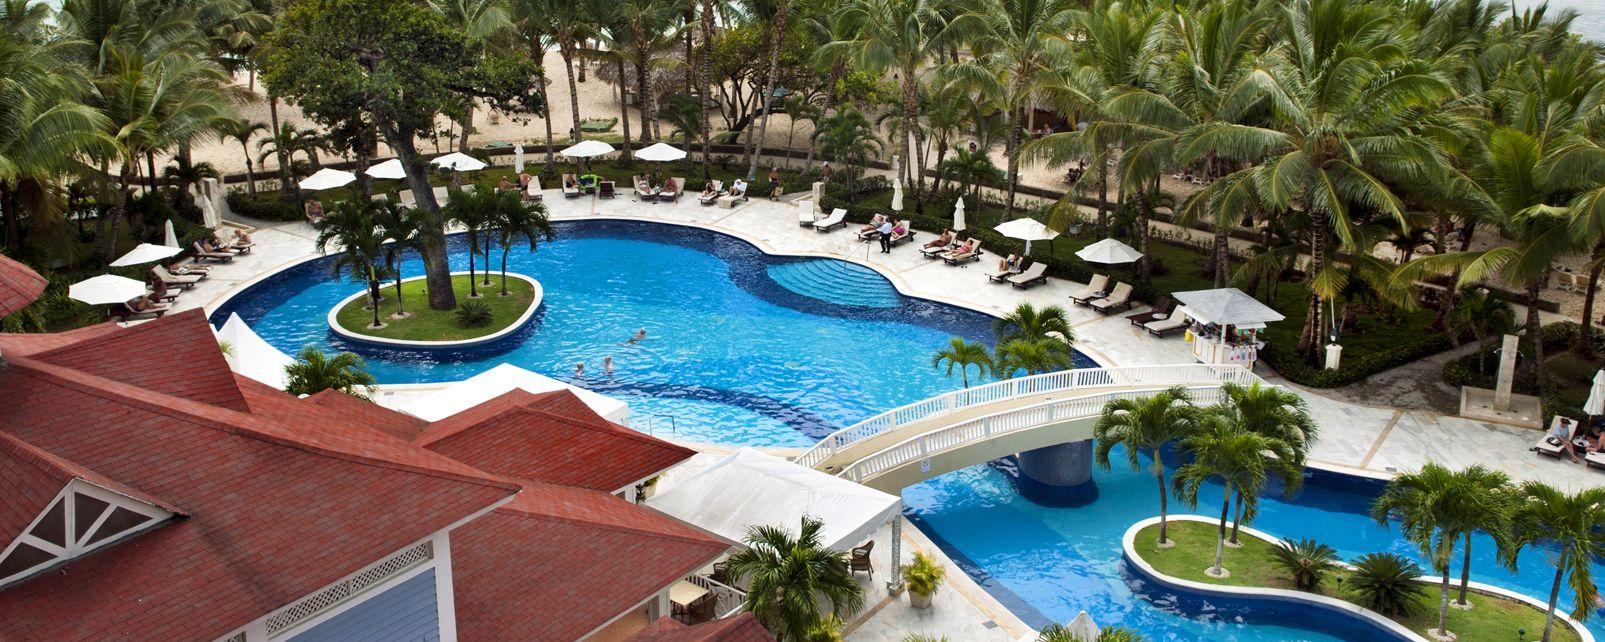 Hotel luxury bahia principe cayo levantado in samana for Hotel luxury cayo levantado